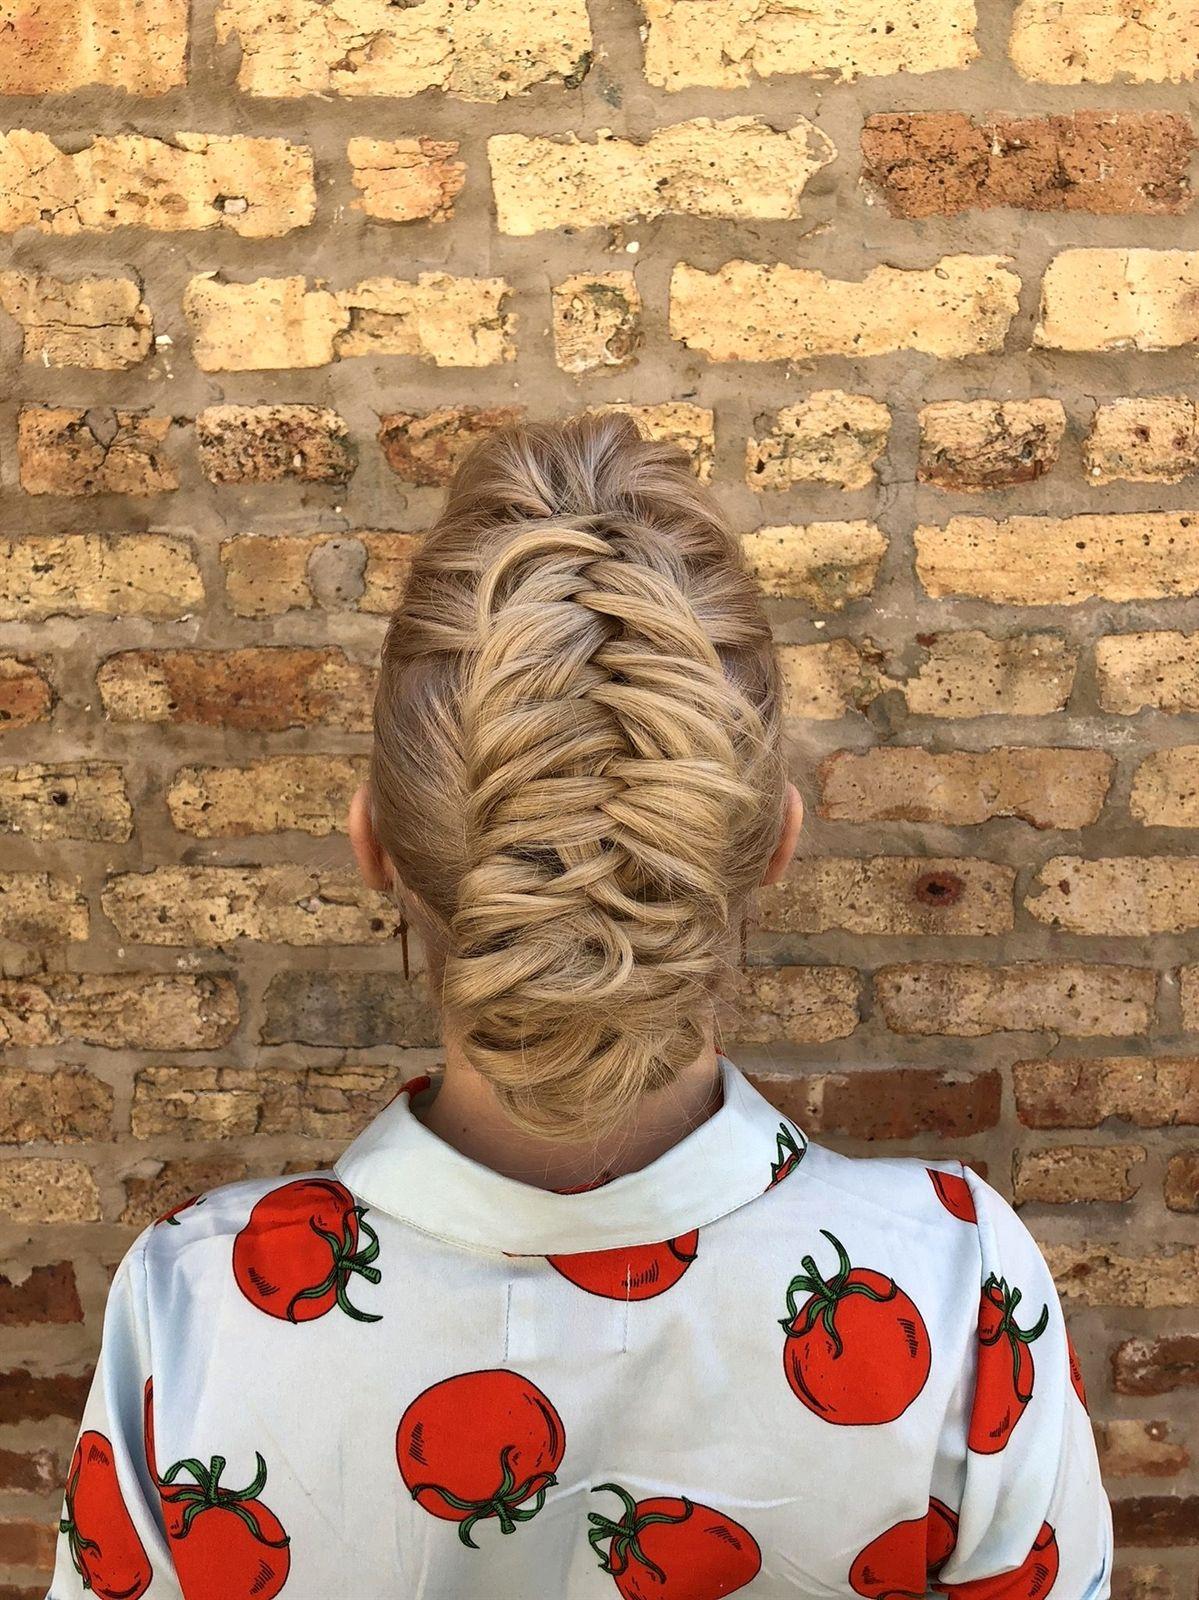 "dutch braided updo | hairstyle by goldplaited <a class=""pintag"" href=""/explore/DutchBraidTutorial/"" title=""#DutchBraidTutorial explore Pinterest"">#DutchBraidTutorial</a><p><a href=""http://www.homeinteriordesign.org/2018/02/short-guide-to-interior-decoration.html"">Short guide to interior decoration</a></p>"